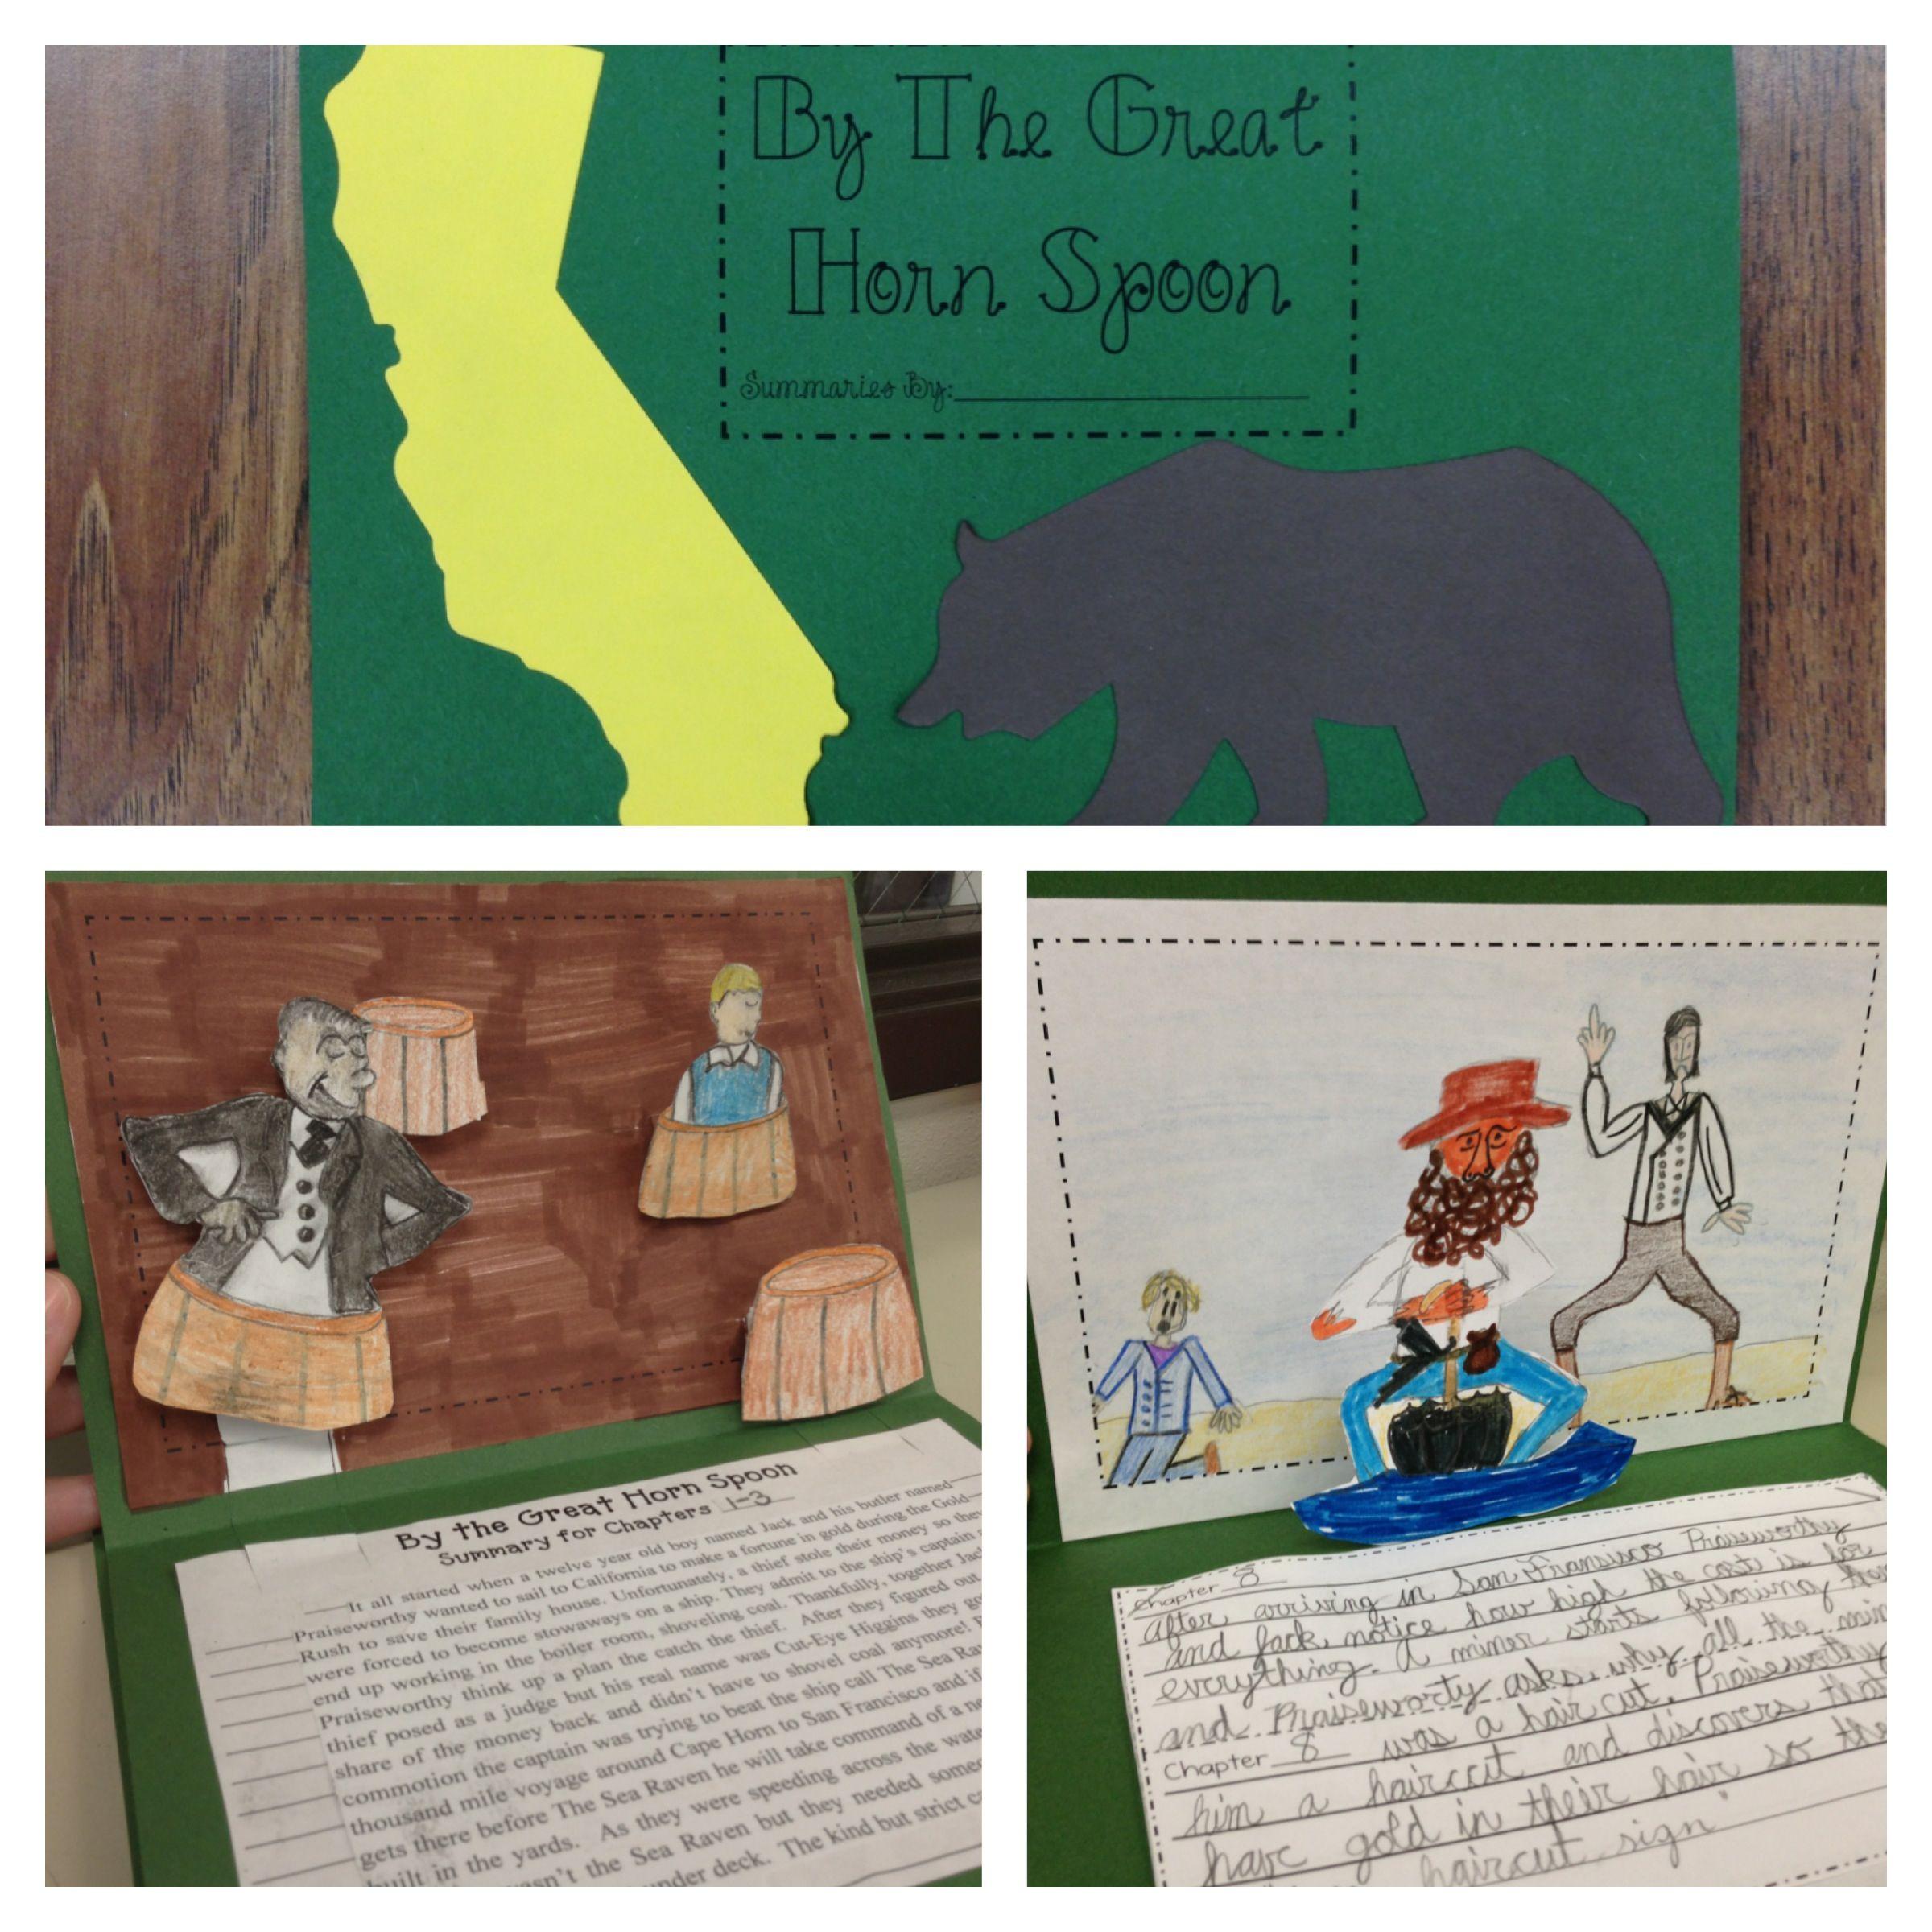 worksheet By The Great Horn Spoon Worksheets by the great horn spoon pop up book summaries 4th grade reading summaries